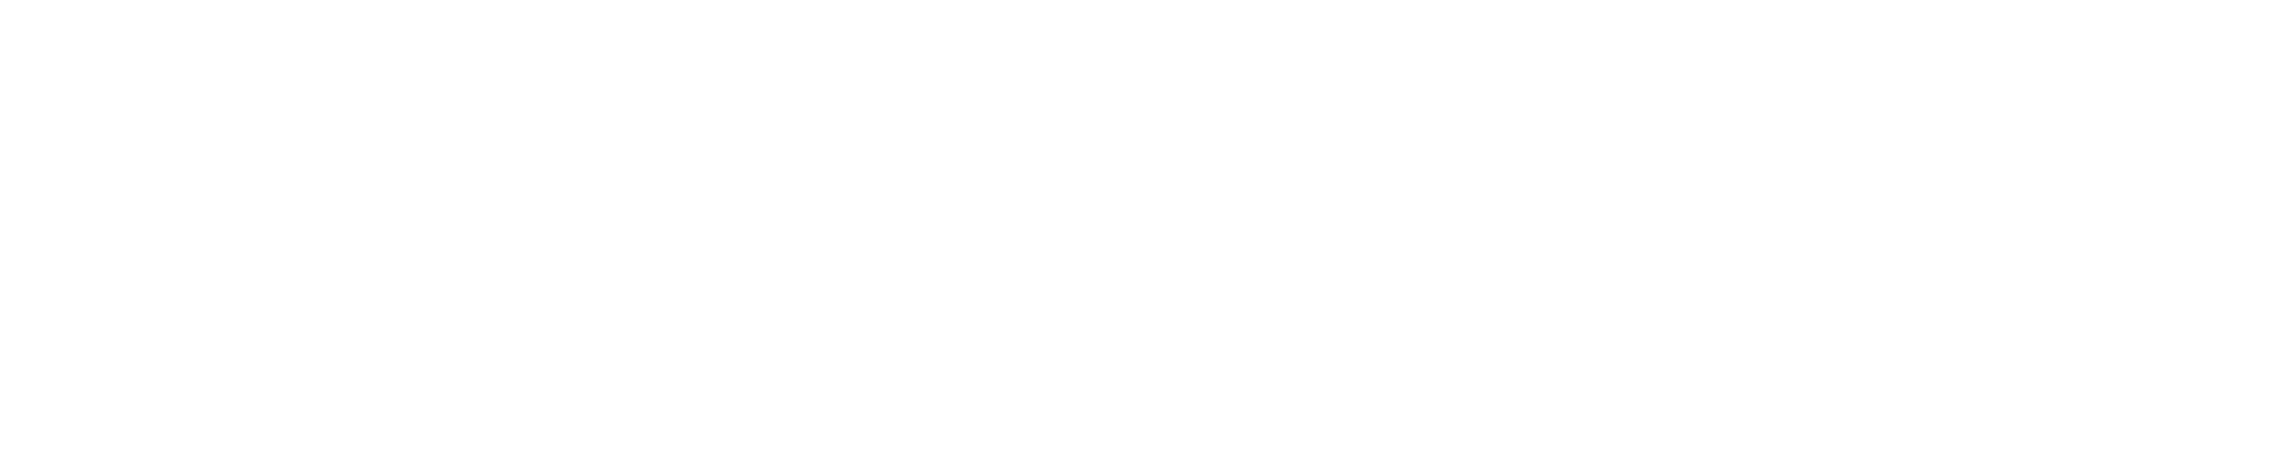 Journals Header, featuring new logo